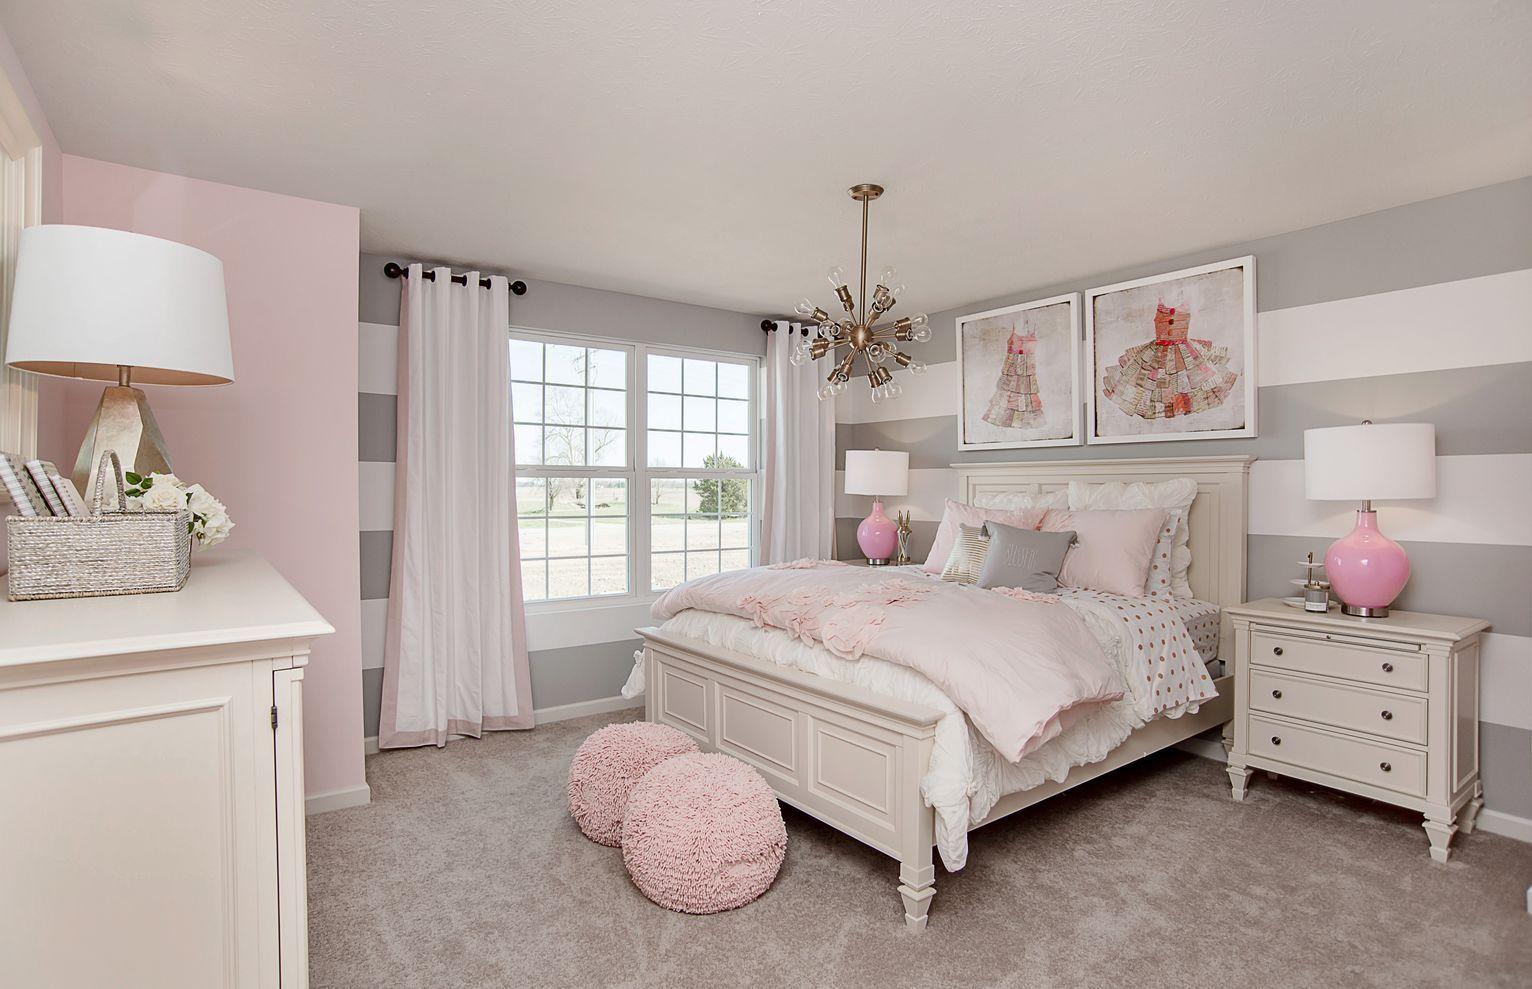 Cute apartment bedroom ideas you will love 48 teen bedroom decorations diy home decor bedroom